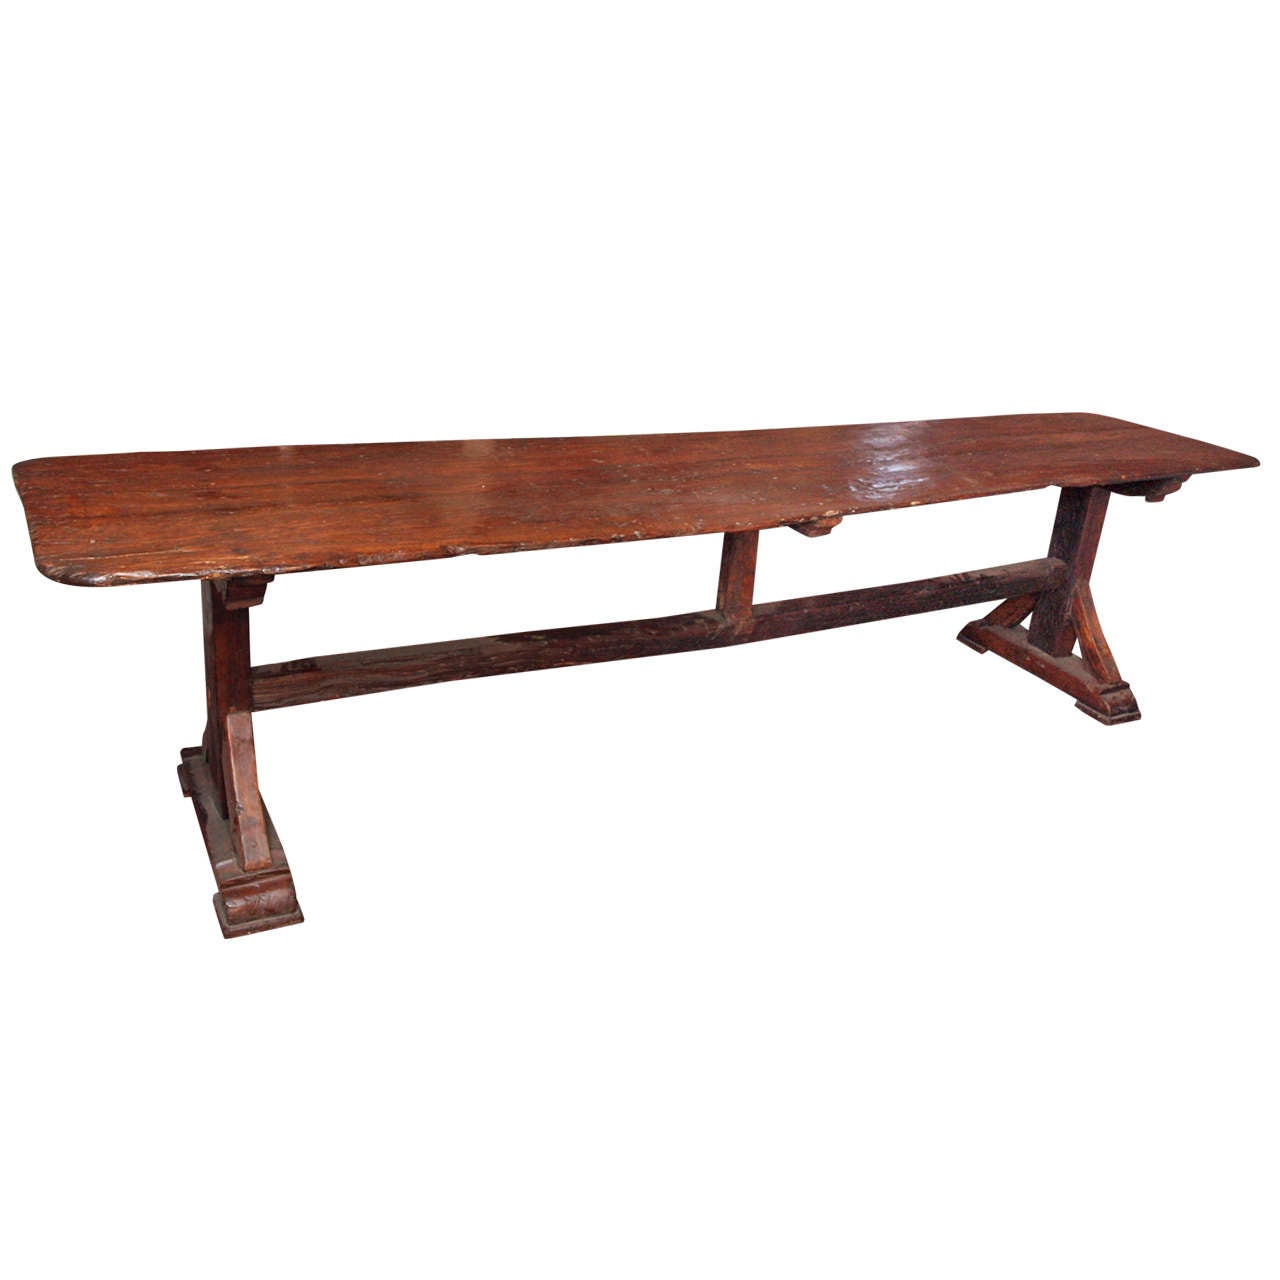 Oak trestle table at stdibs